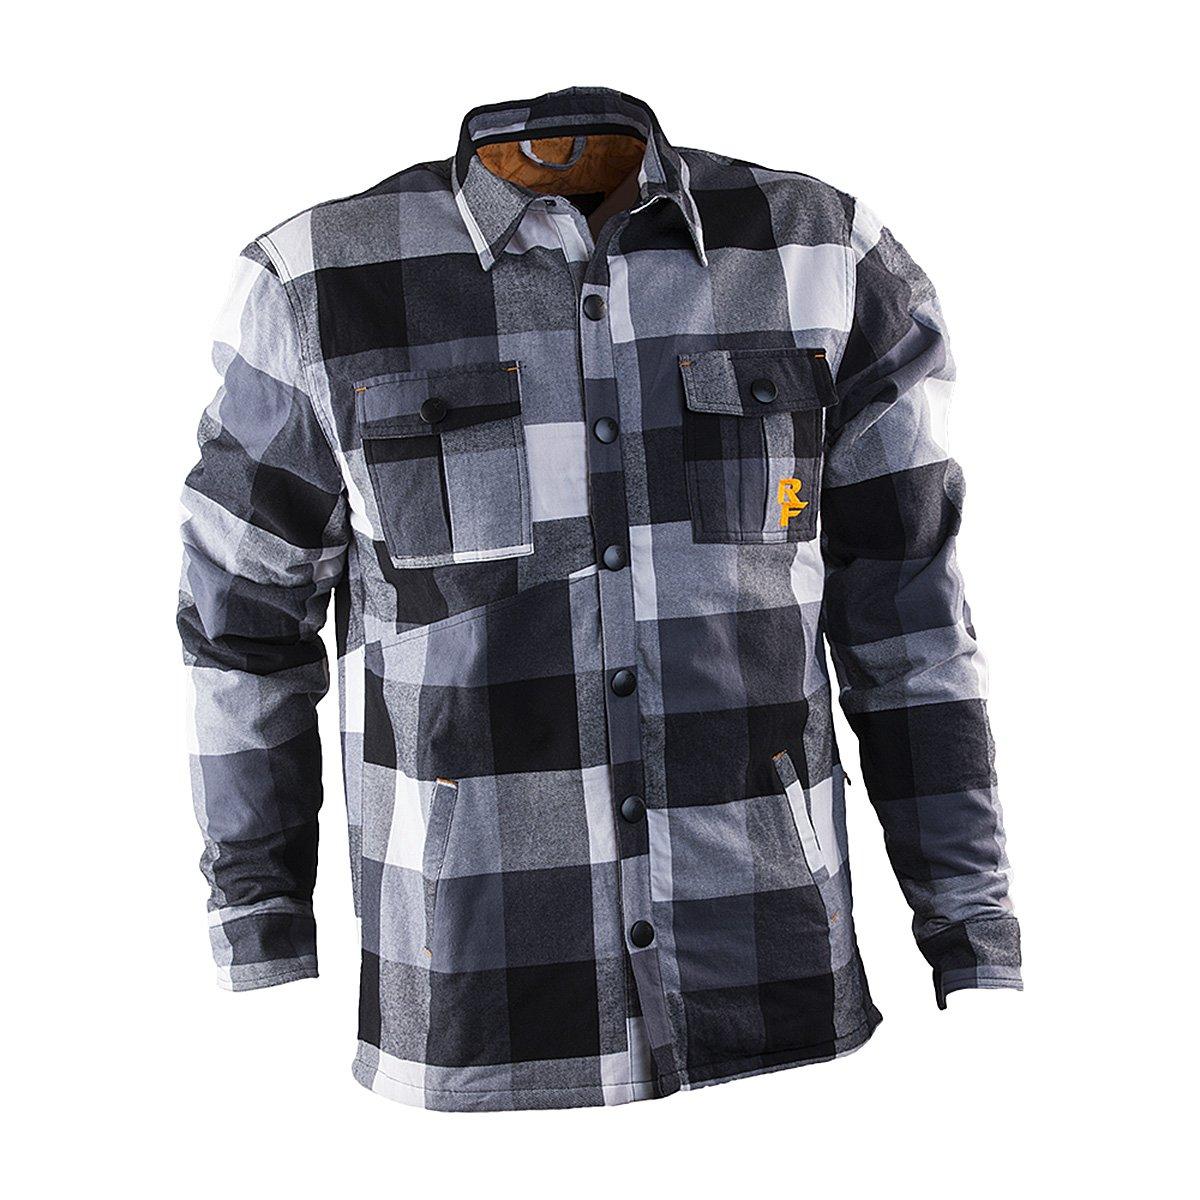 RaceFace Loam Ranger Jacket, Black/White, Small